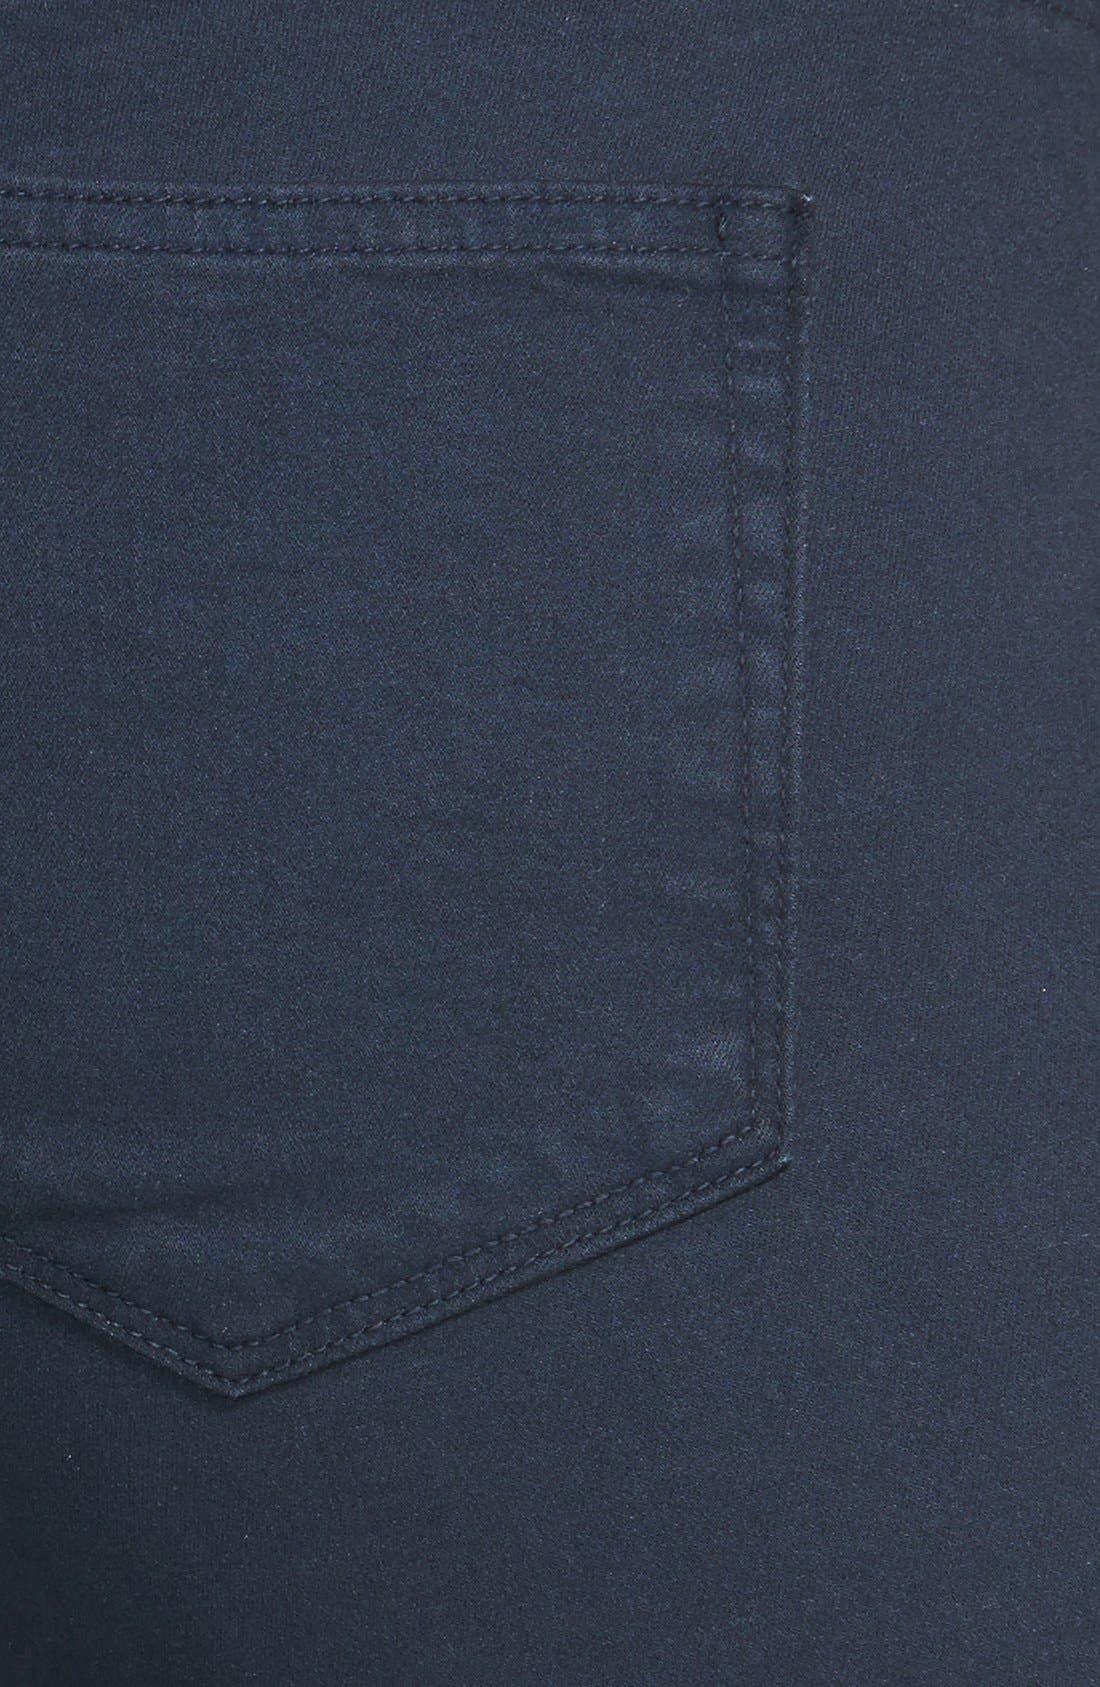 Alternate Image 3  - Paige Denim 'Verdugo' Skinny Ankle Jeans (Azure)